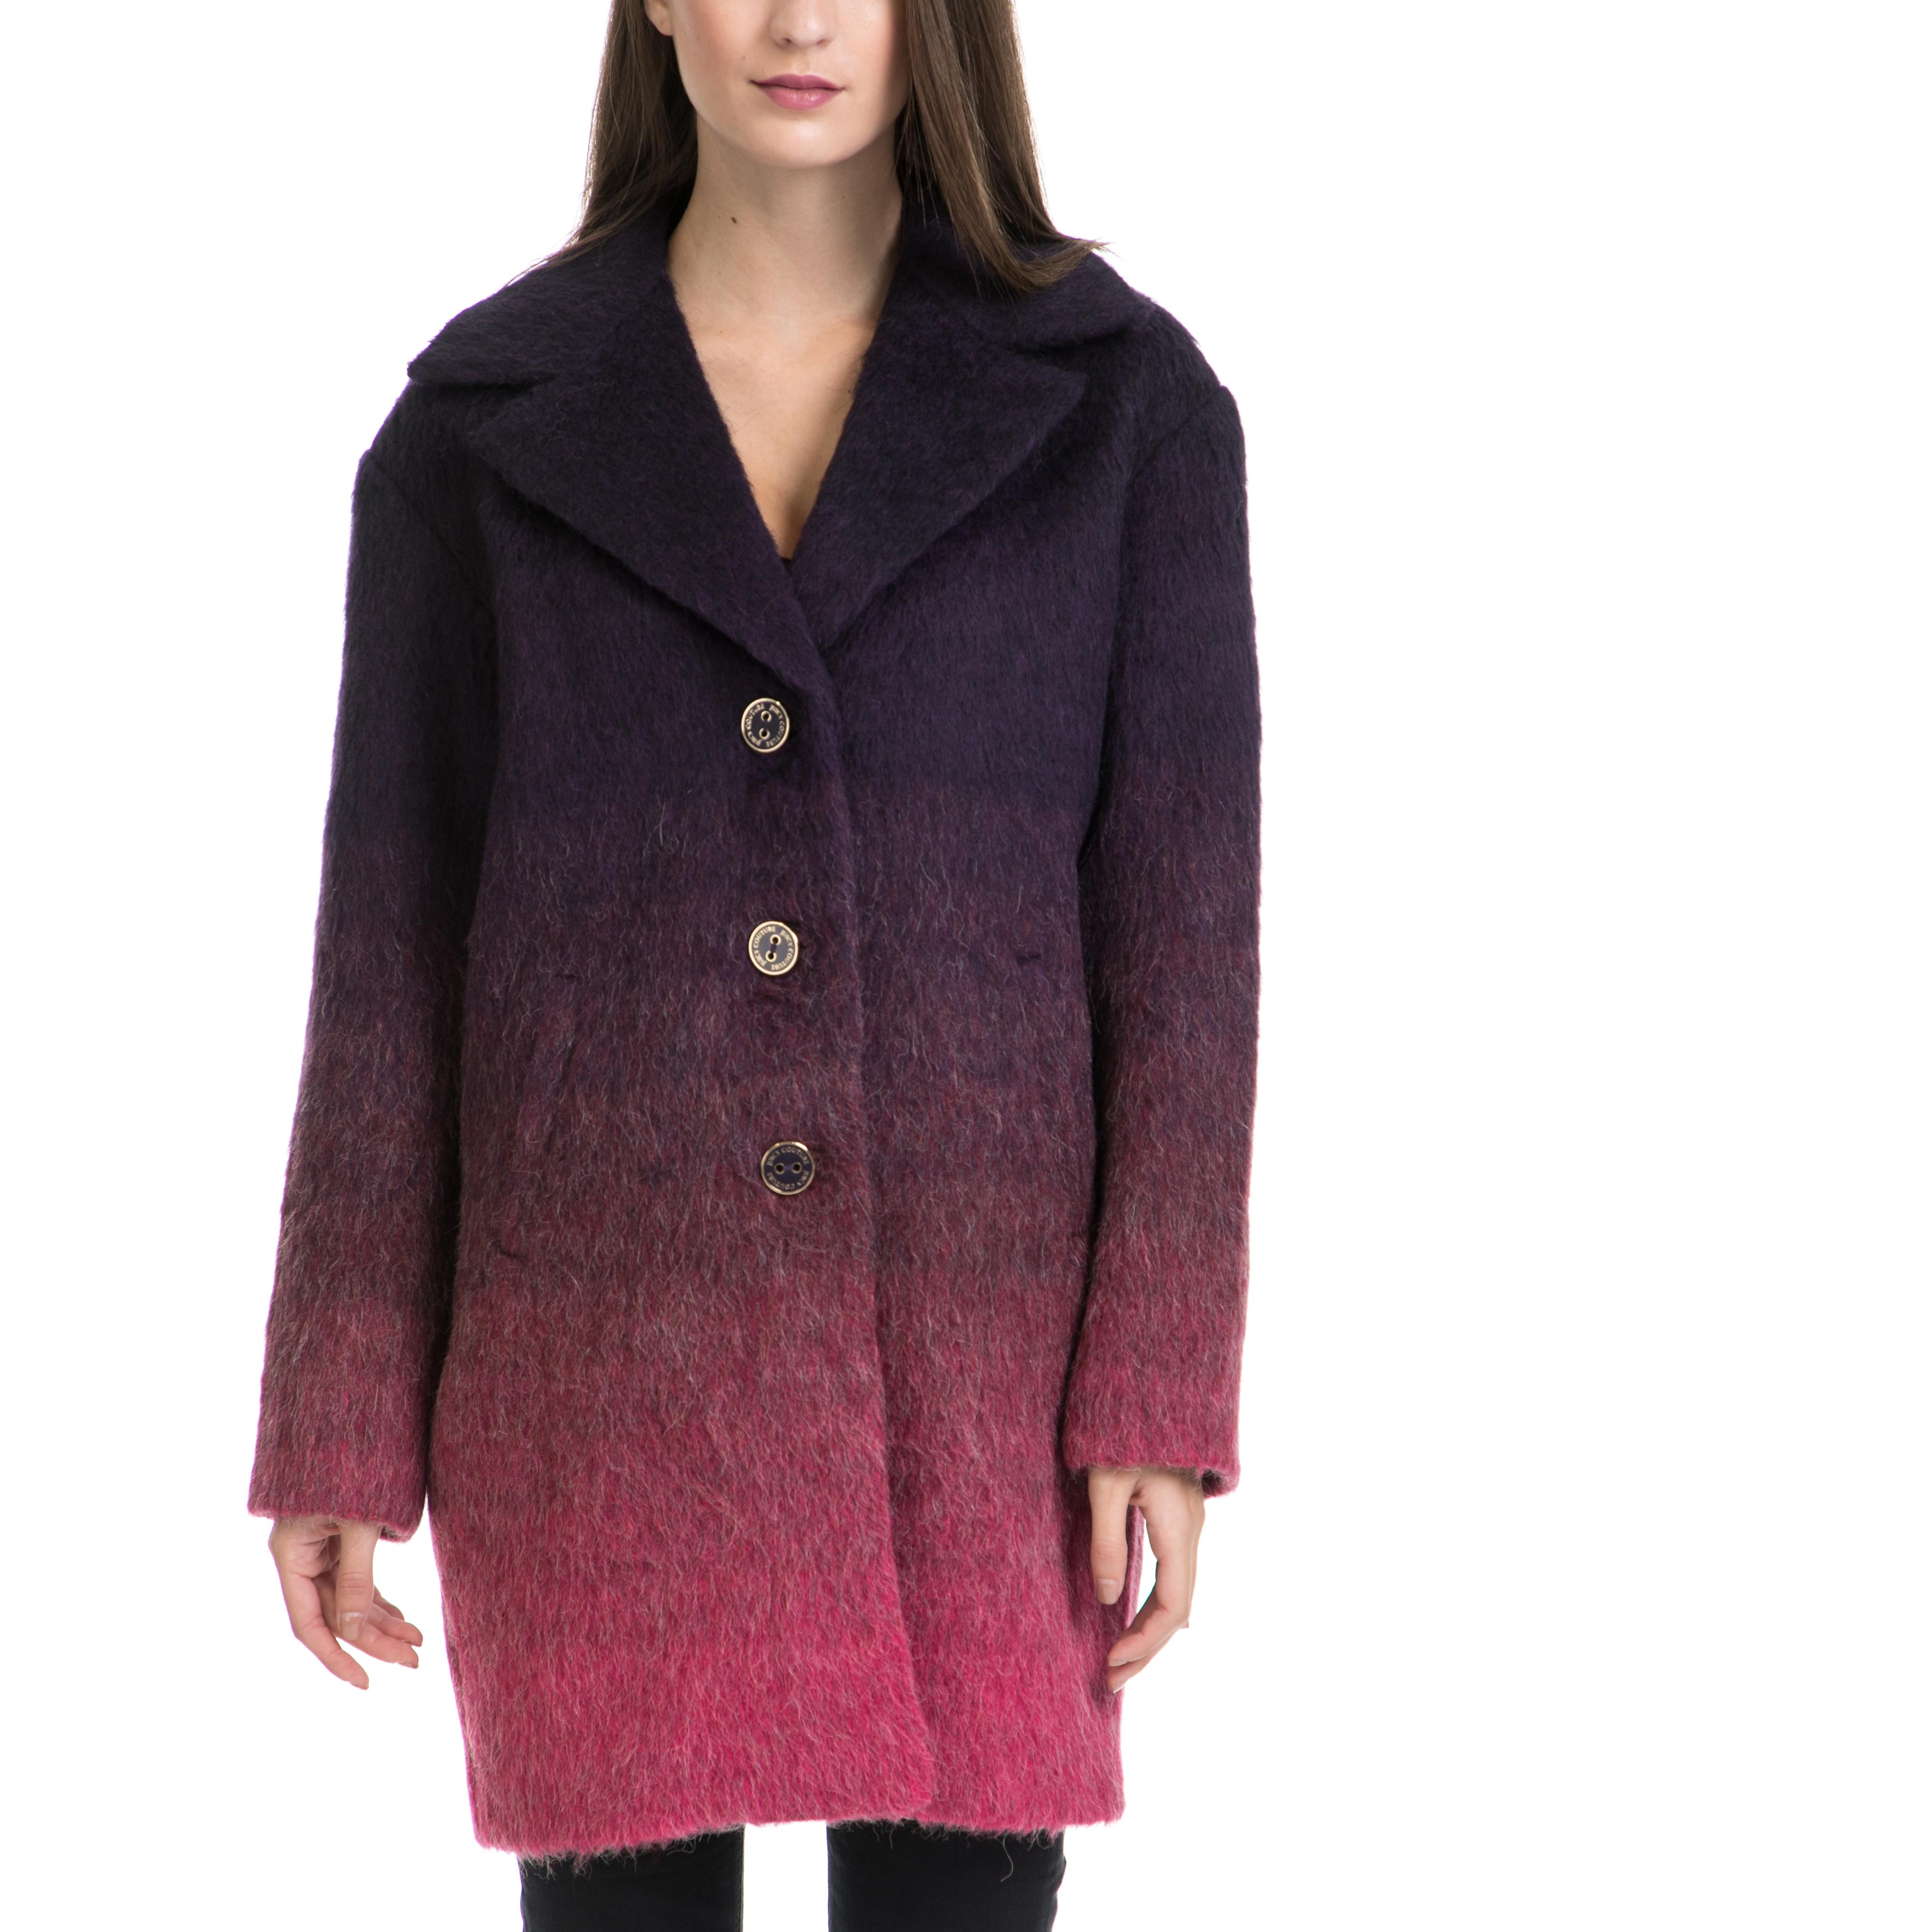 JUICY COUTURE - Γυναικείο παλτό WOOLY OMBRE COAT μωβ γυναικεία ρούχα πανωφόρια παλτό